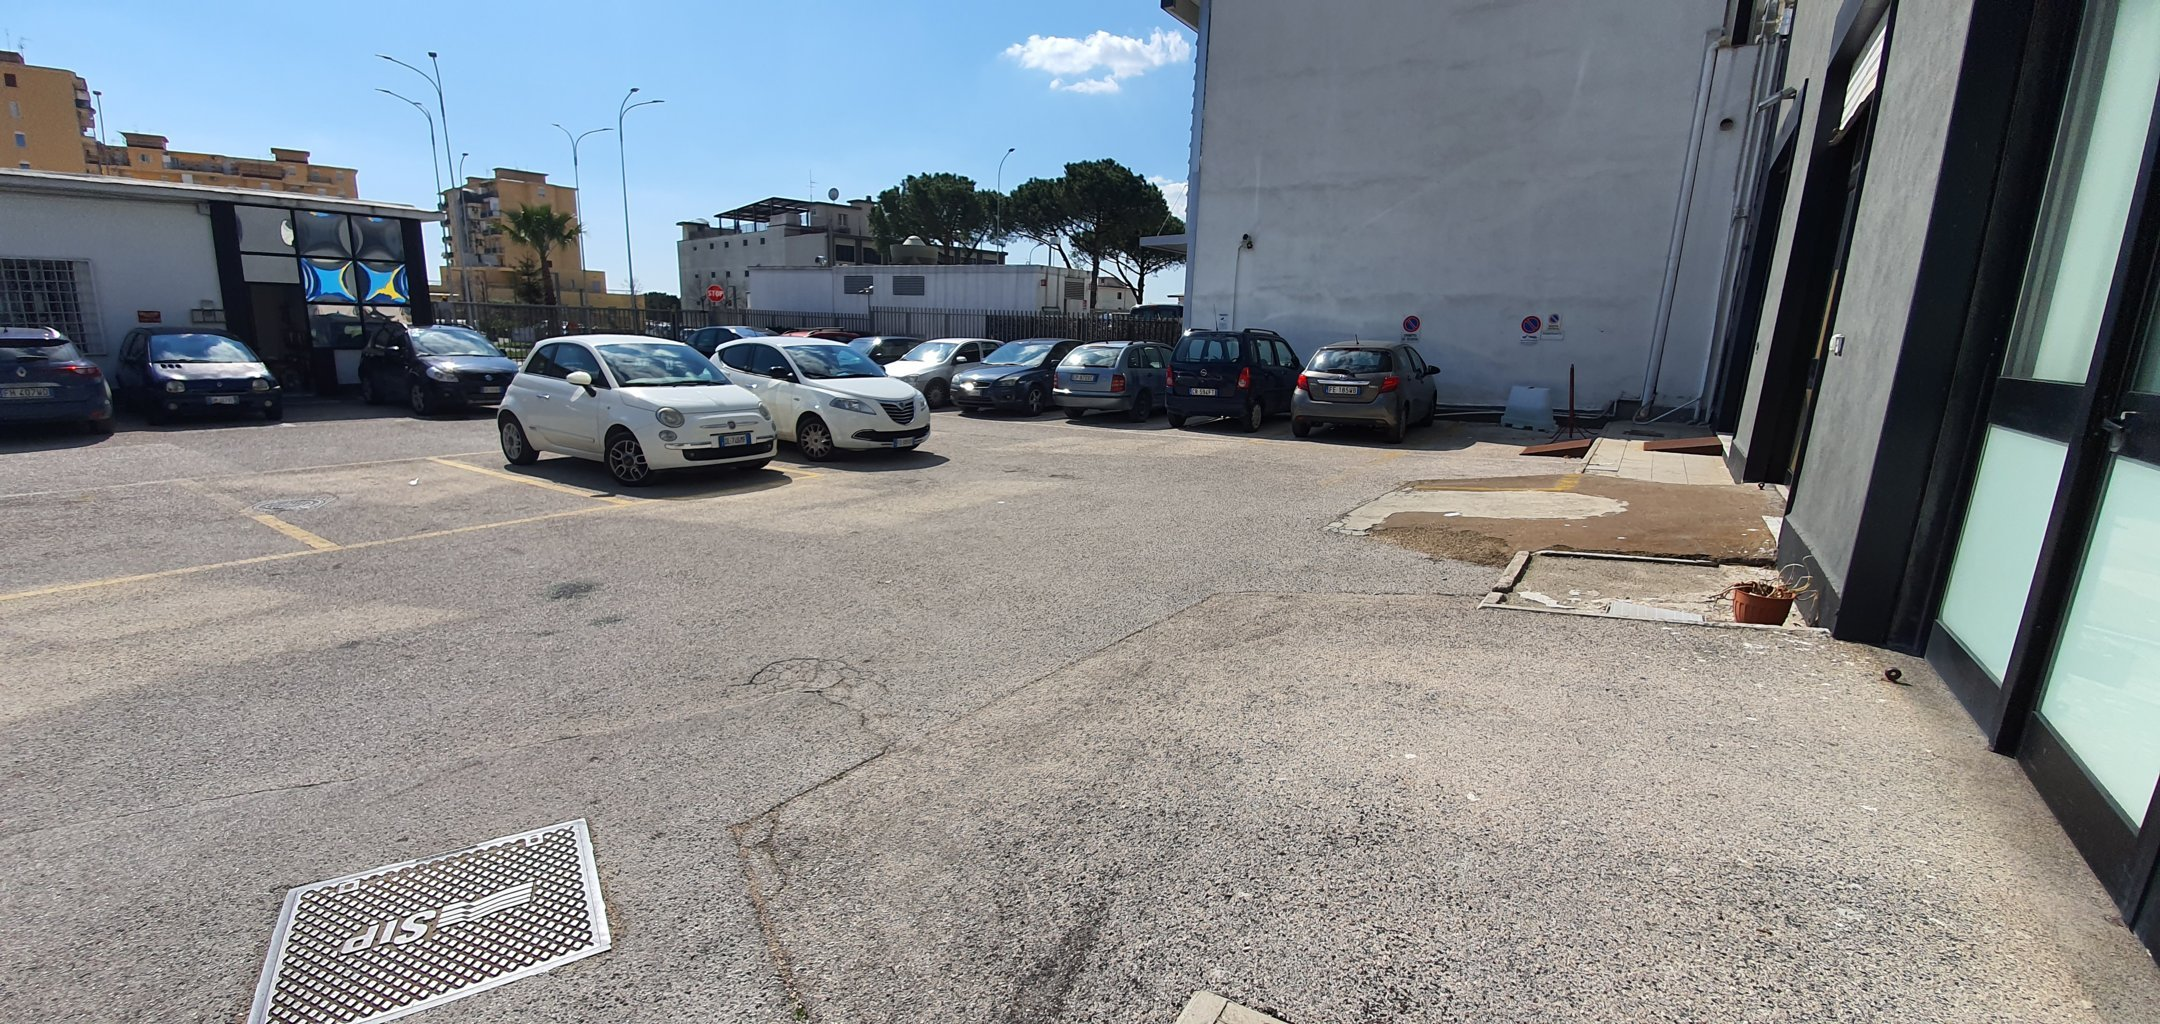 Polo imprenditoriale Napoli